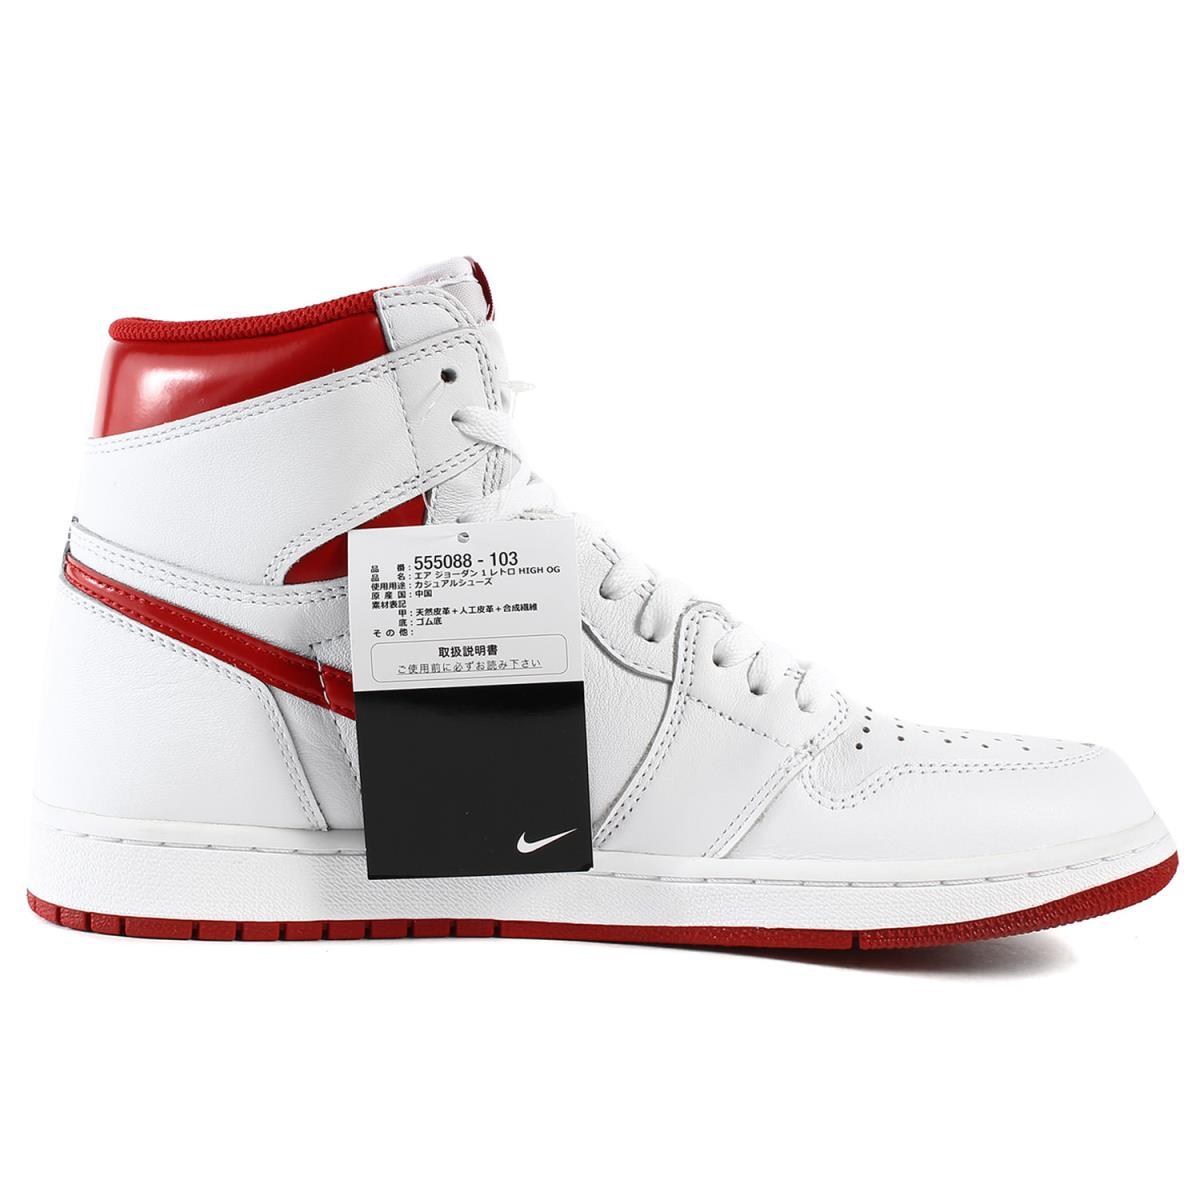 0d943eaa3dd BEEGLE by Boo-Bee: NIKE (Nike) AIR JORDAN 1 RETRO HIGH OG METALLIC ...